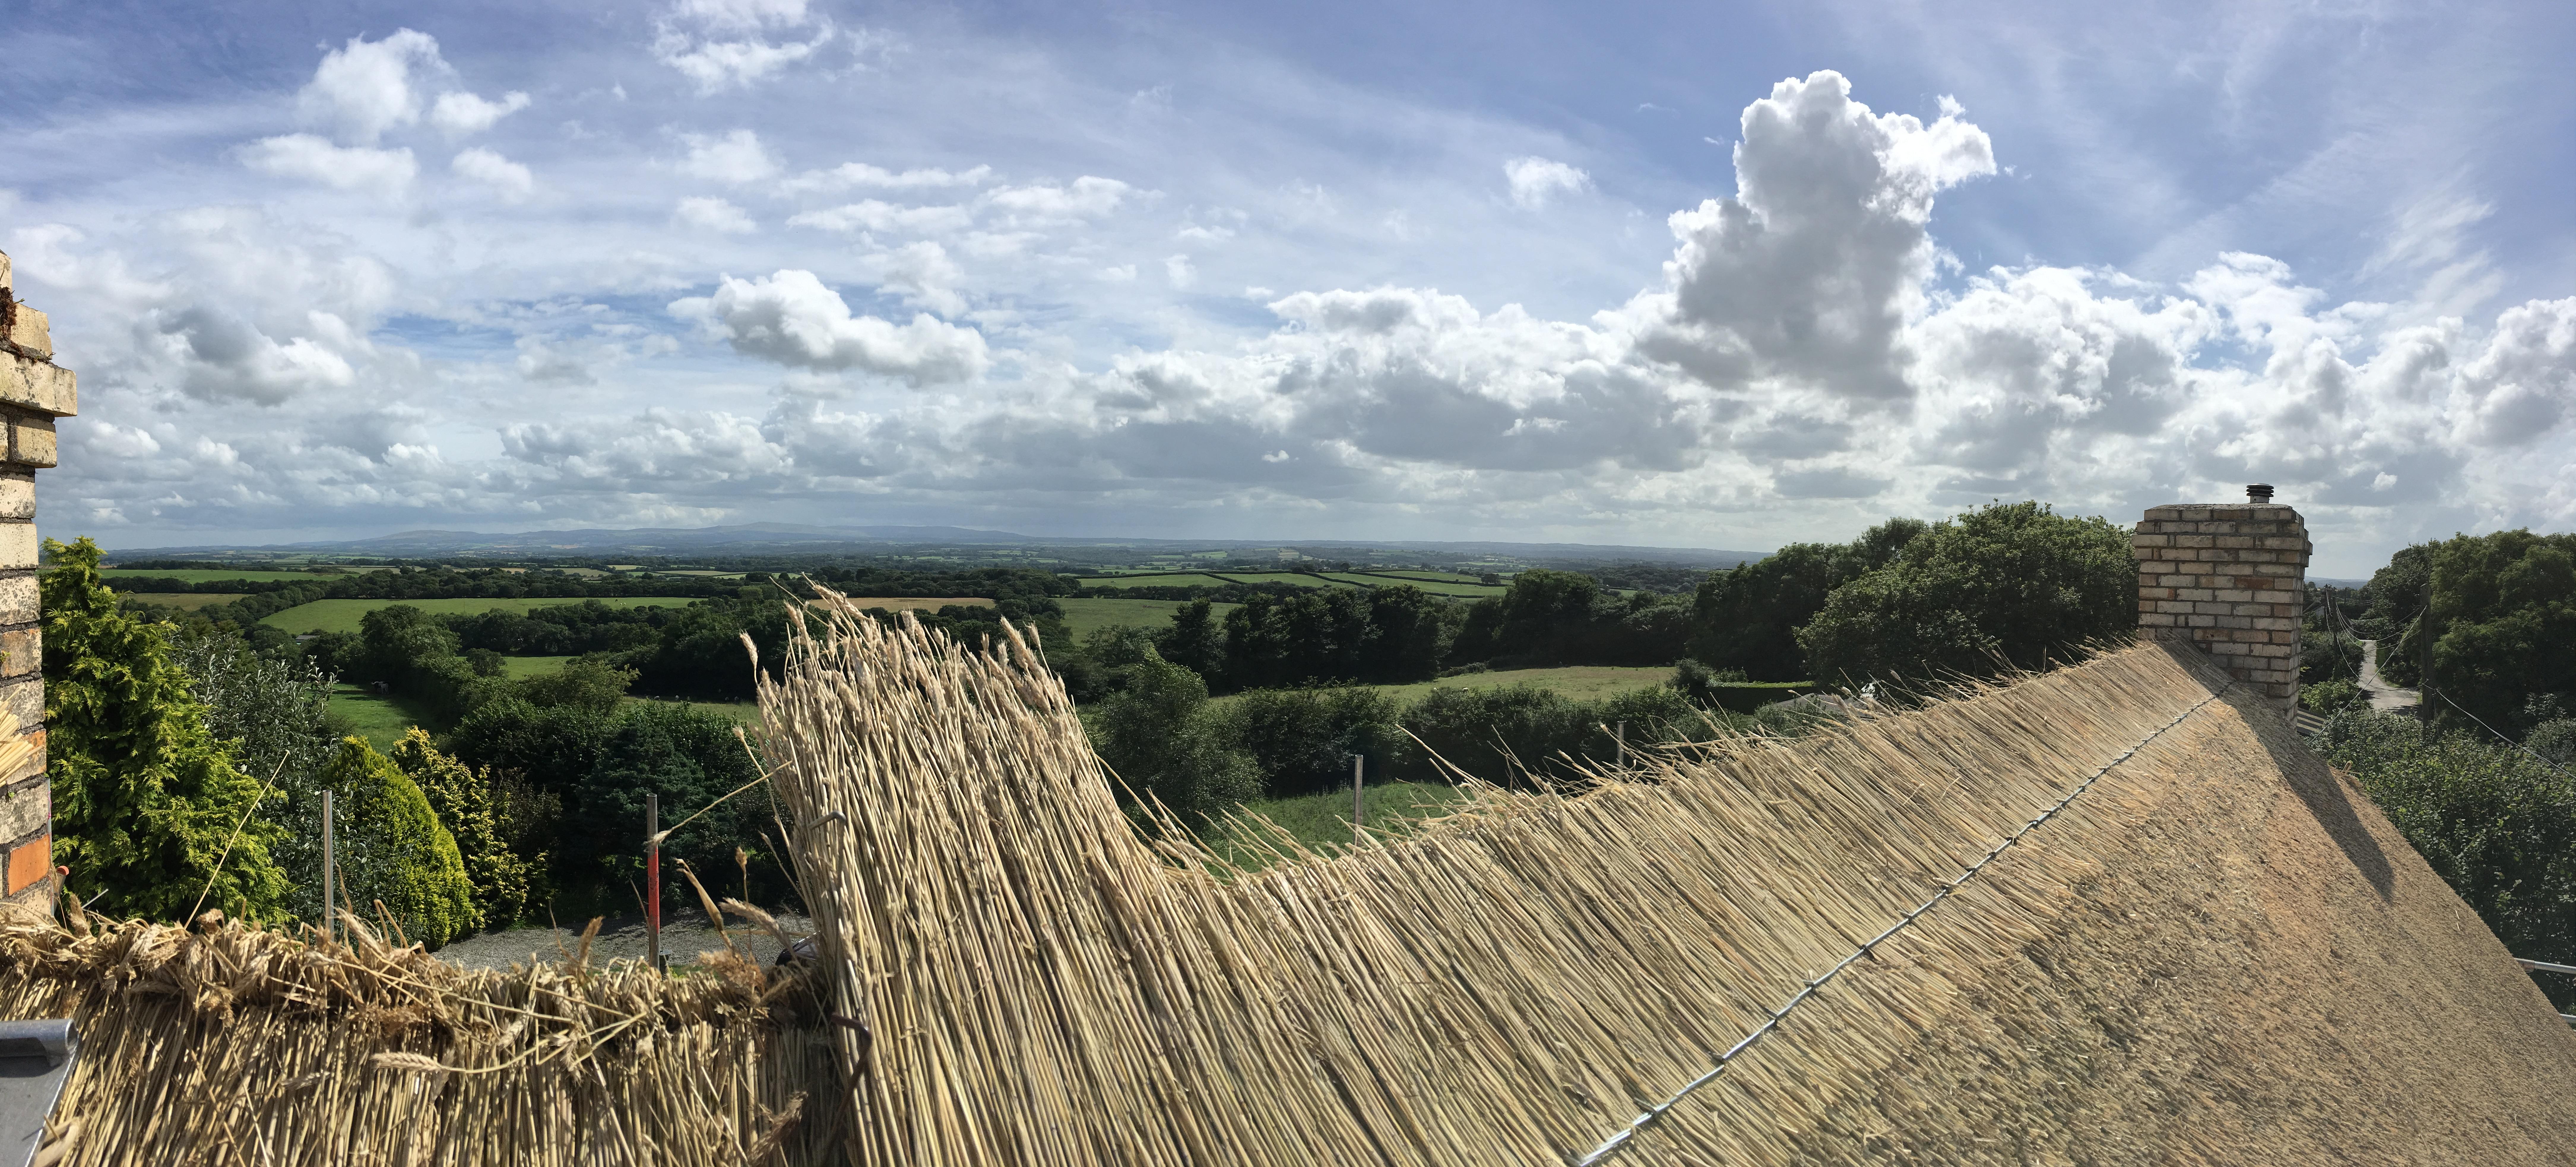 Ridge laying, Winkleigh, Devon